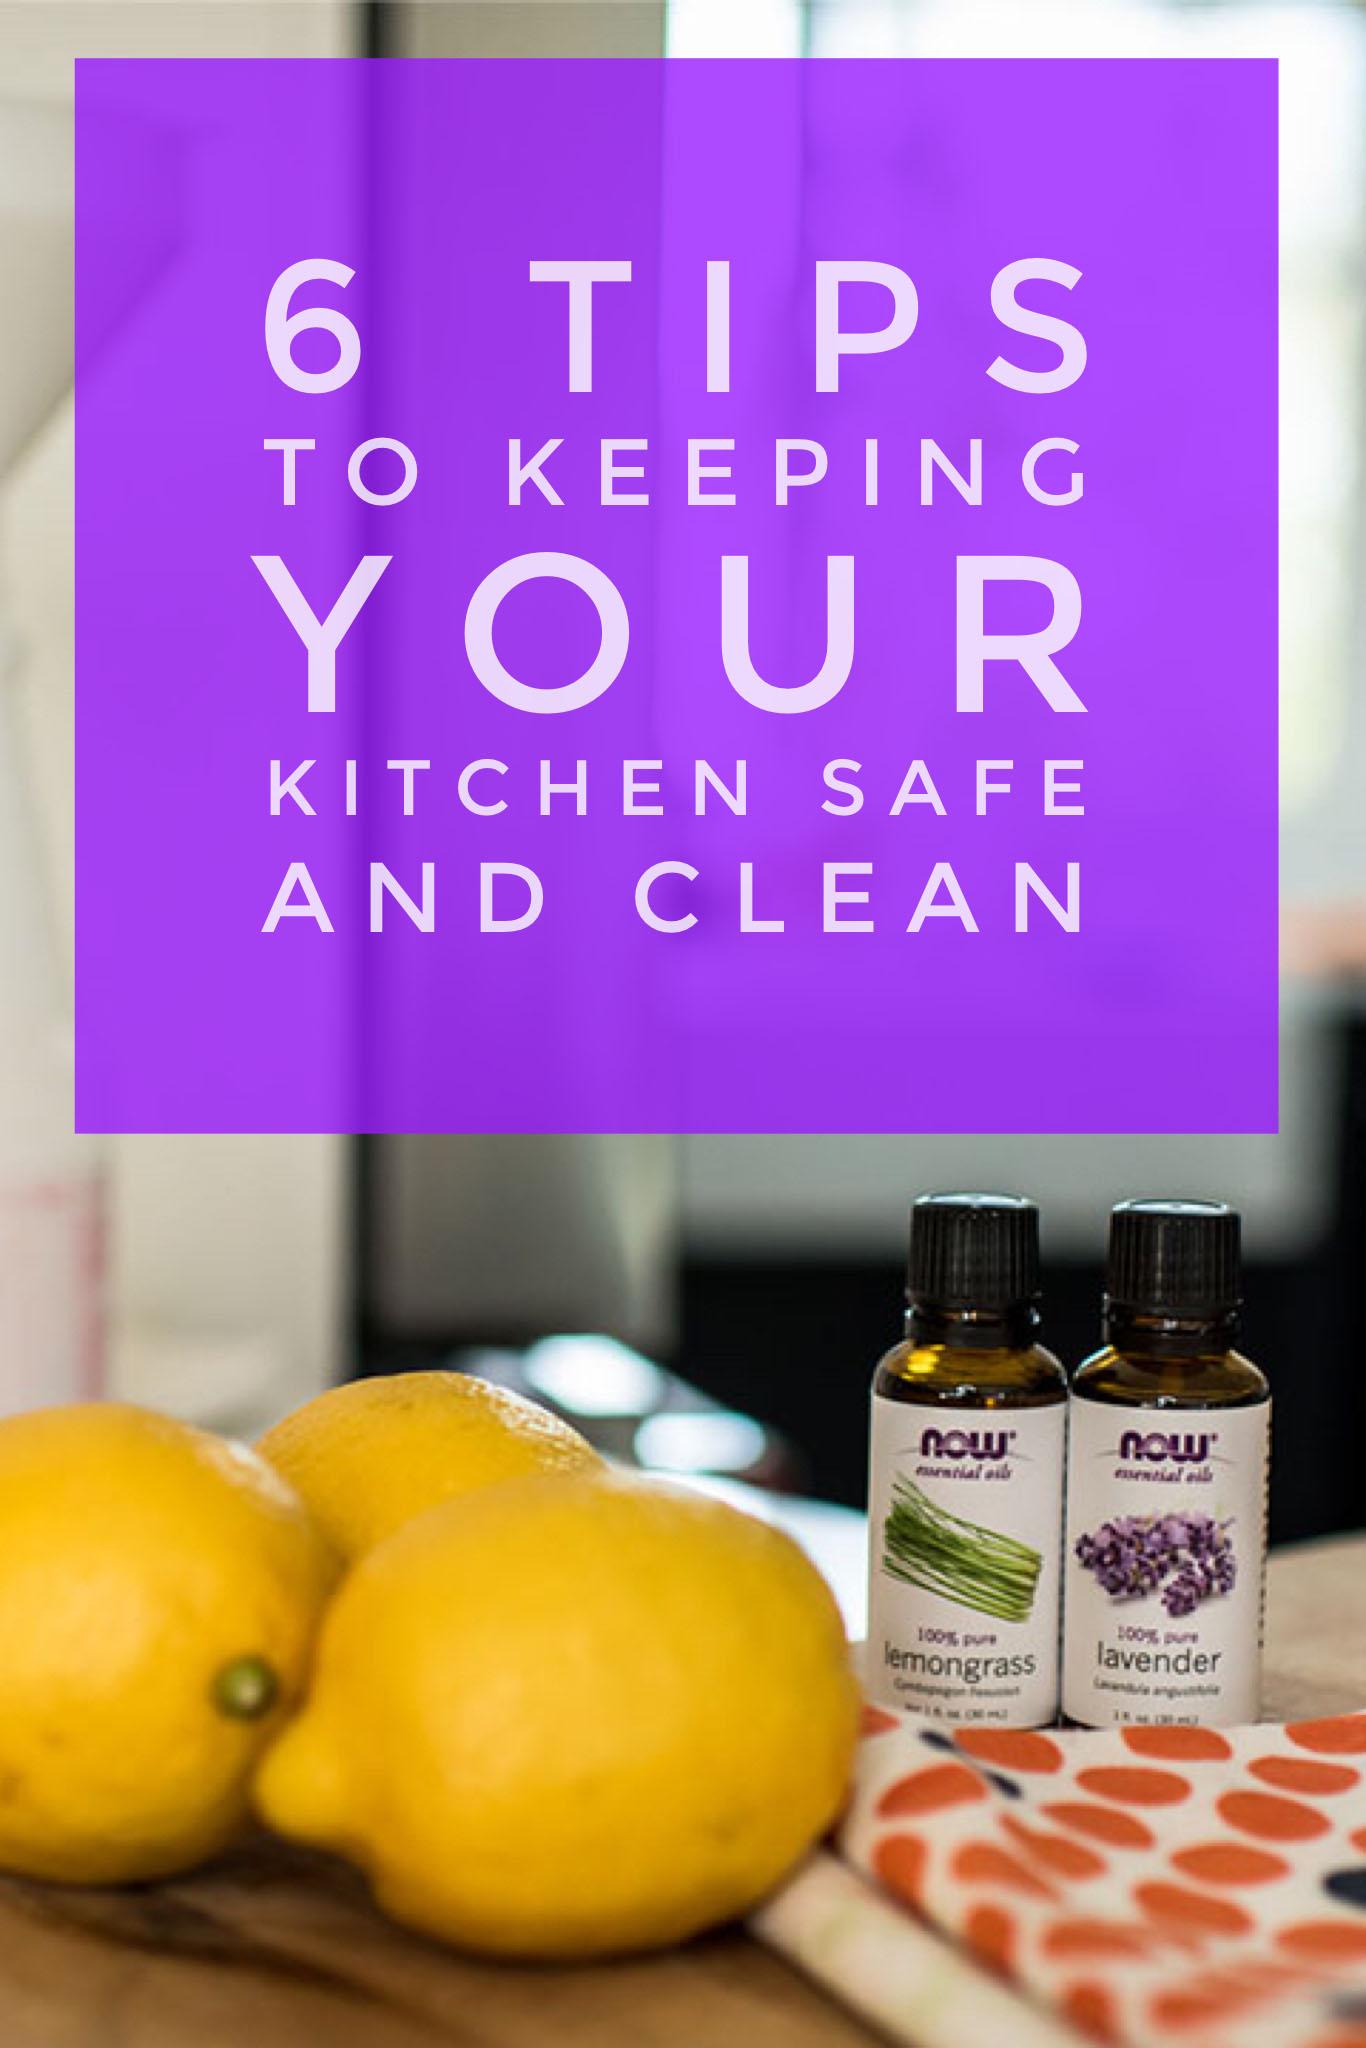 Keeping Ktichen Safe and Clean_Pinterest copy.jpg